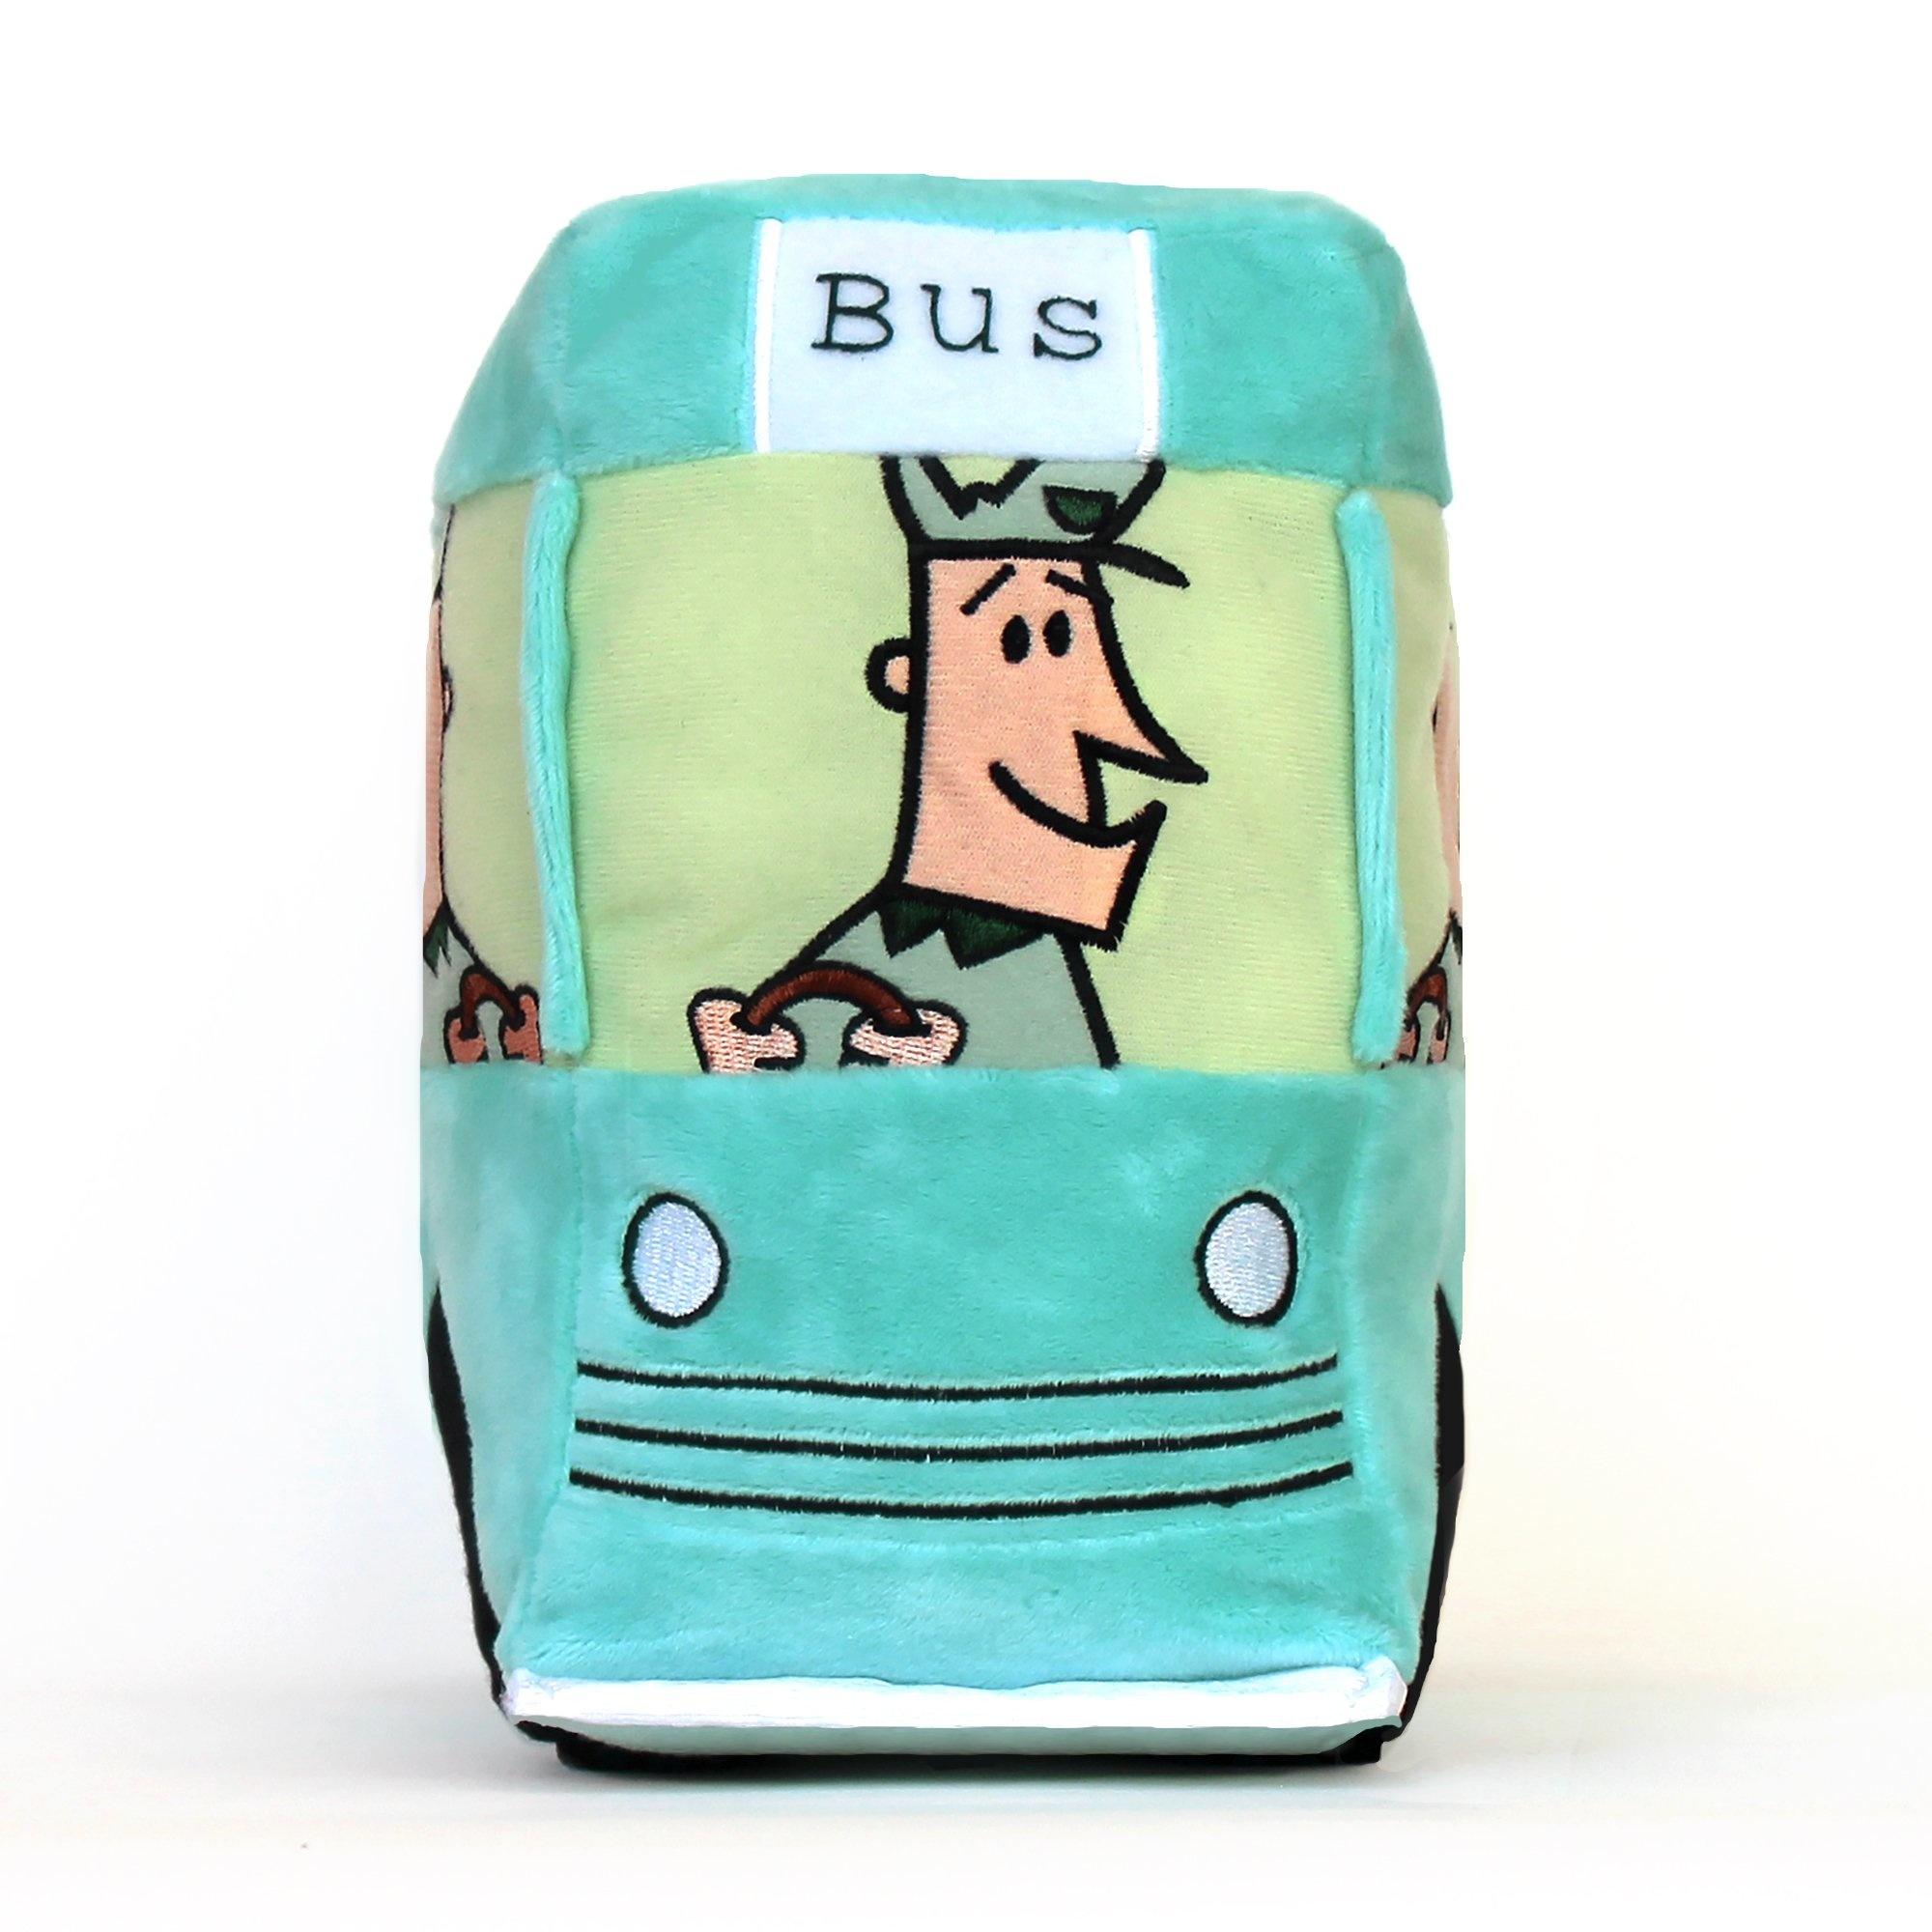 Yottoy Bus Soft Toy